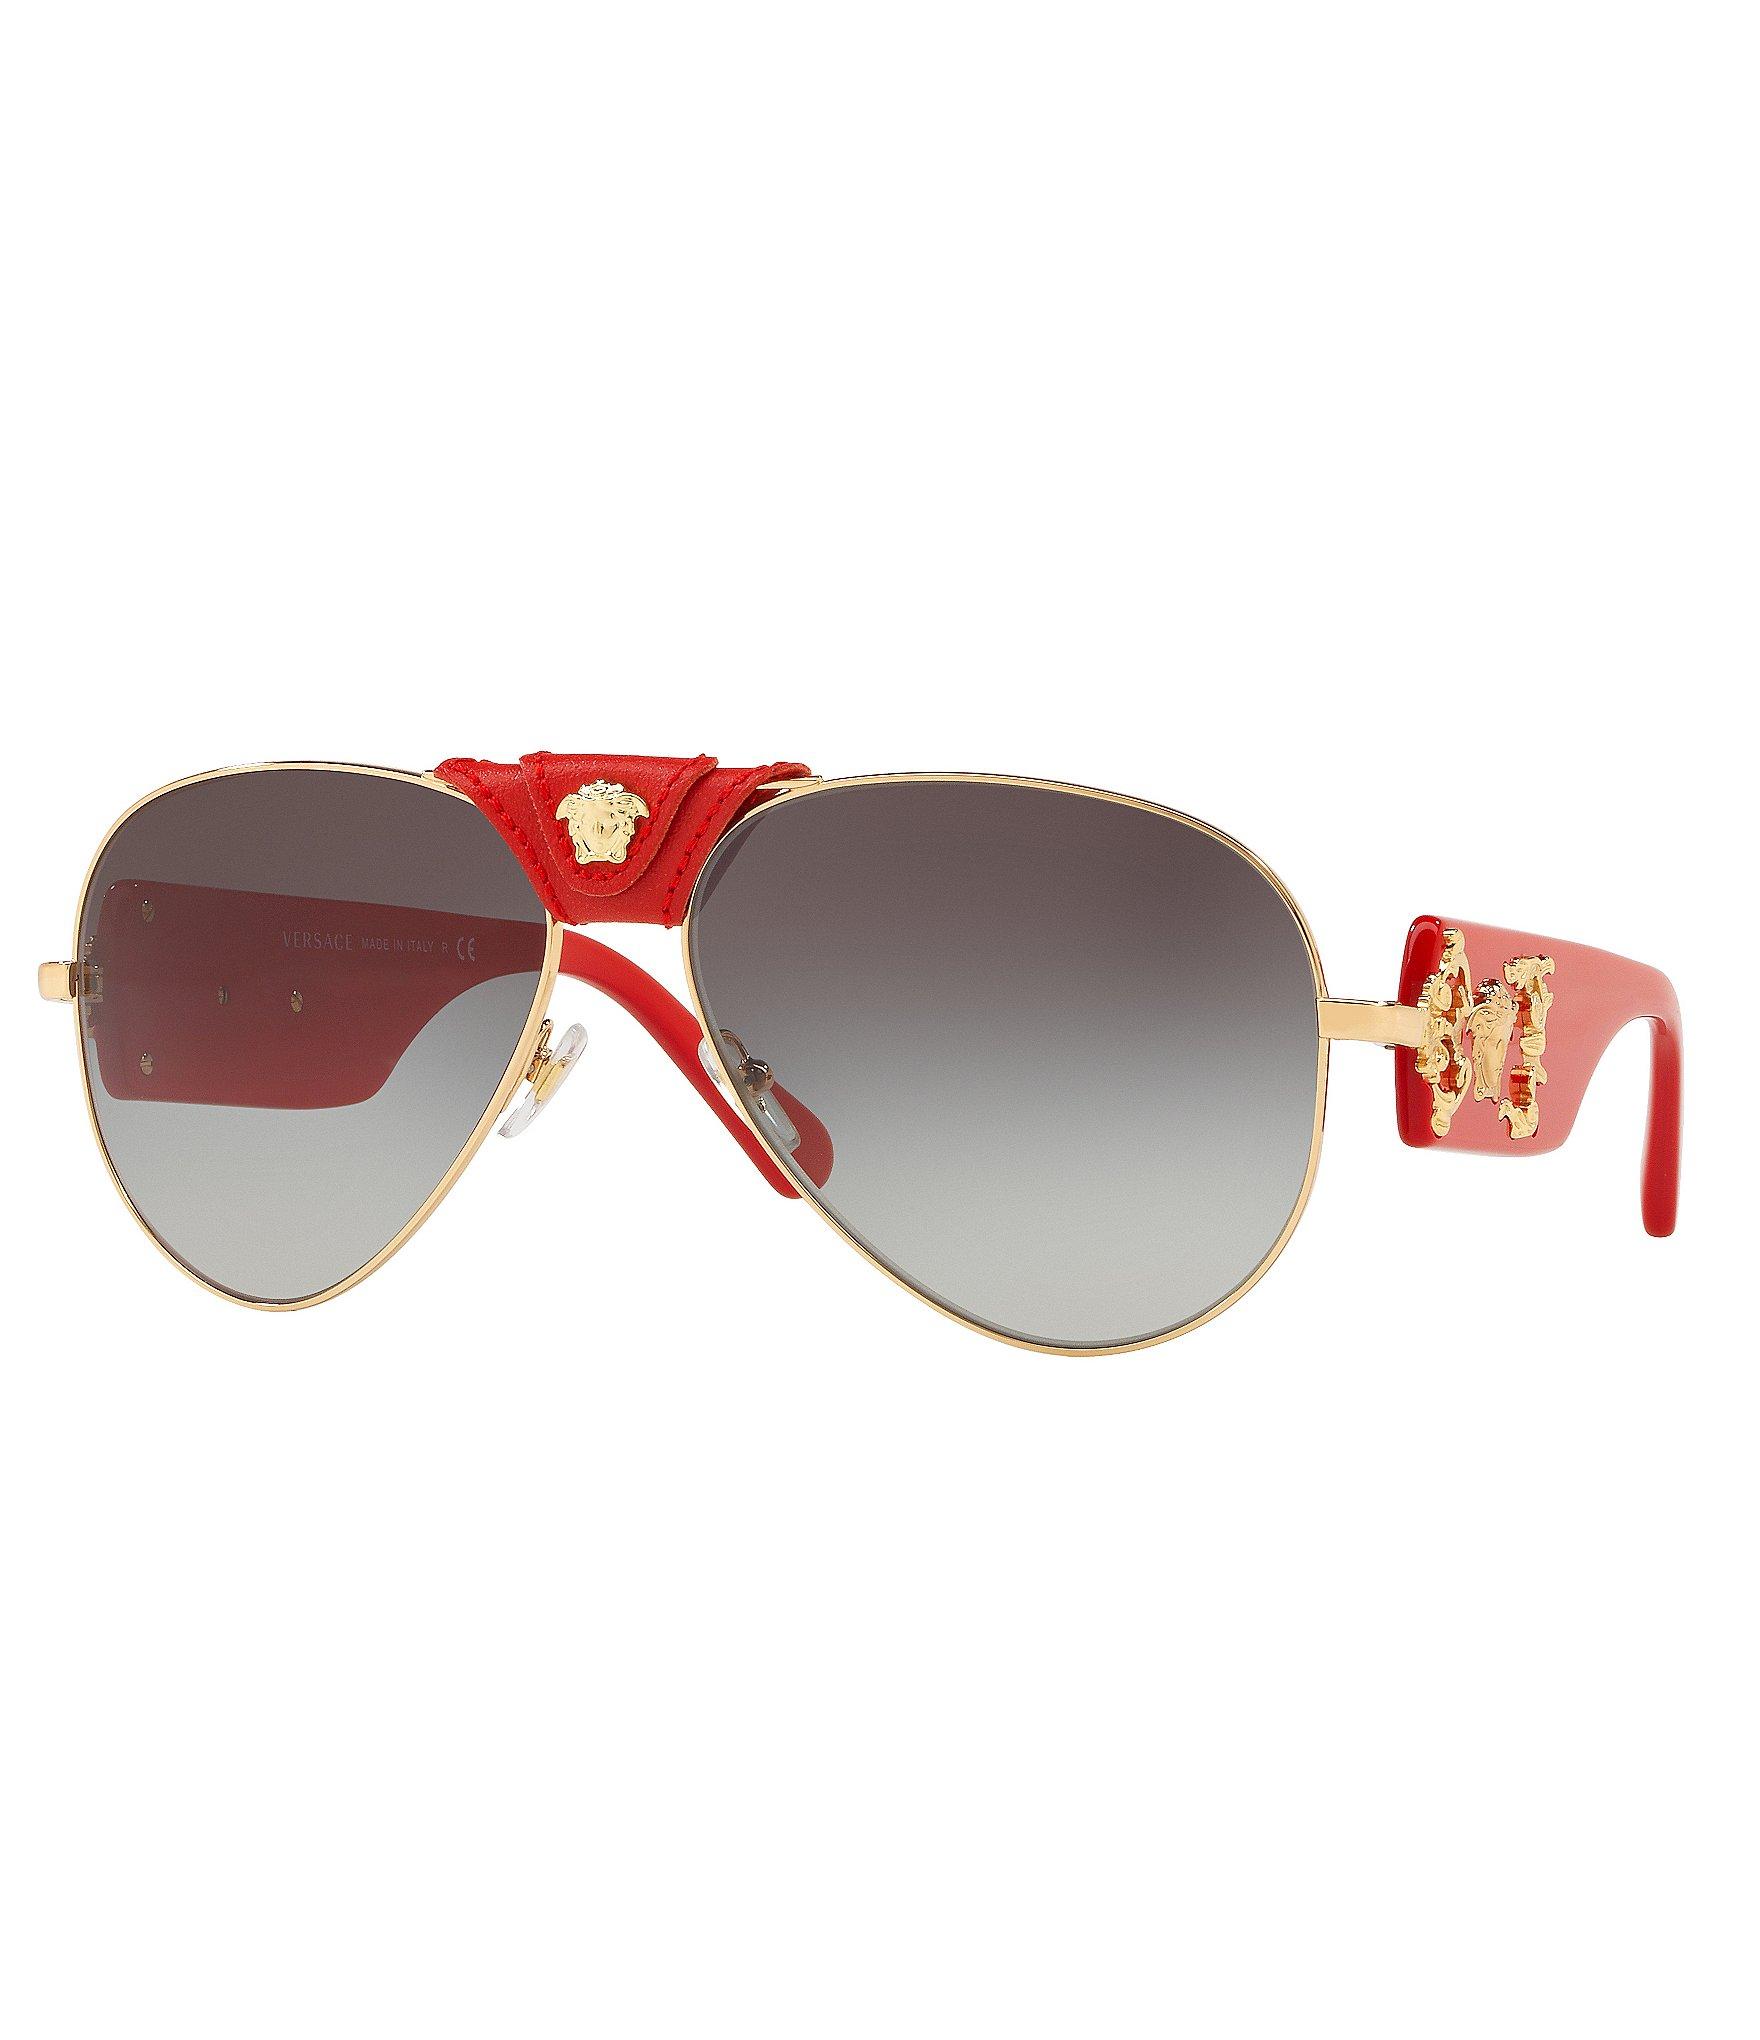 96aac520d44 Metal Men s Aviator Sunglasses